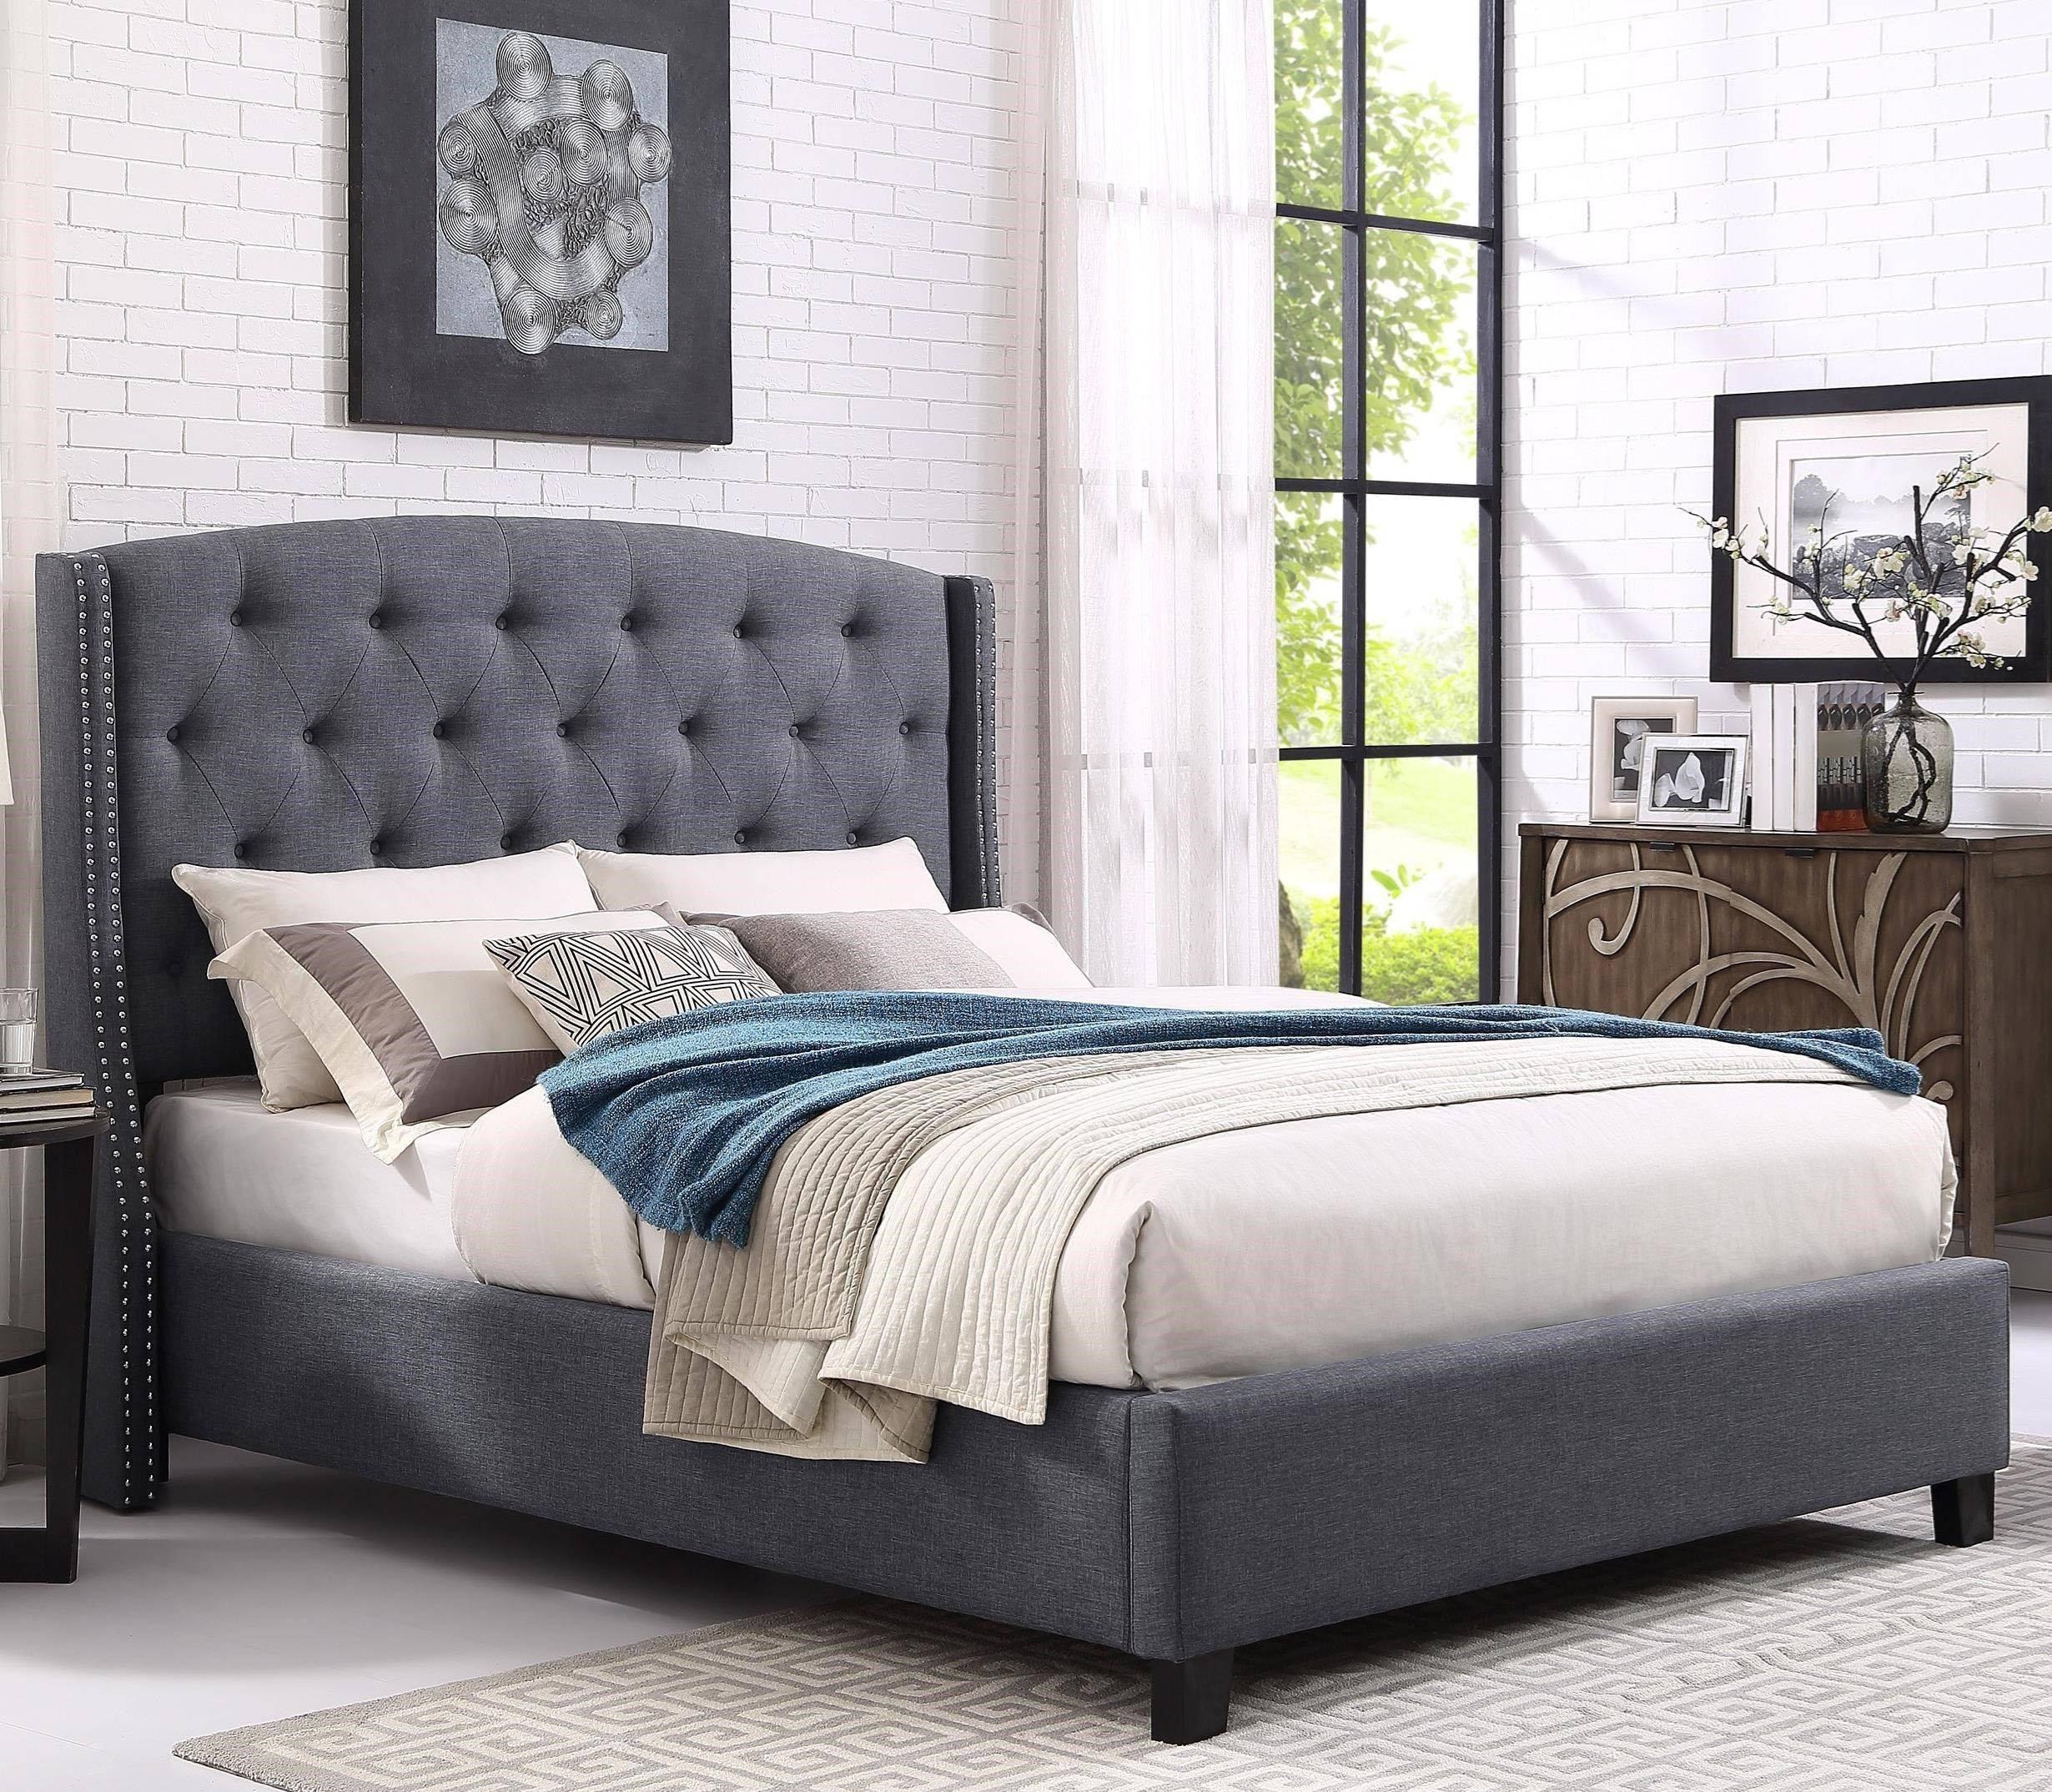 Buy Crown Mark Eva 5111 King Platform Bed In Gray Fabric Online